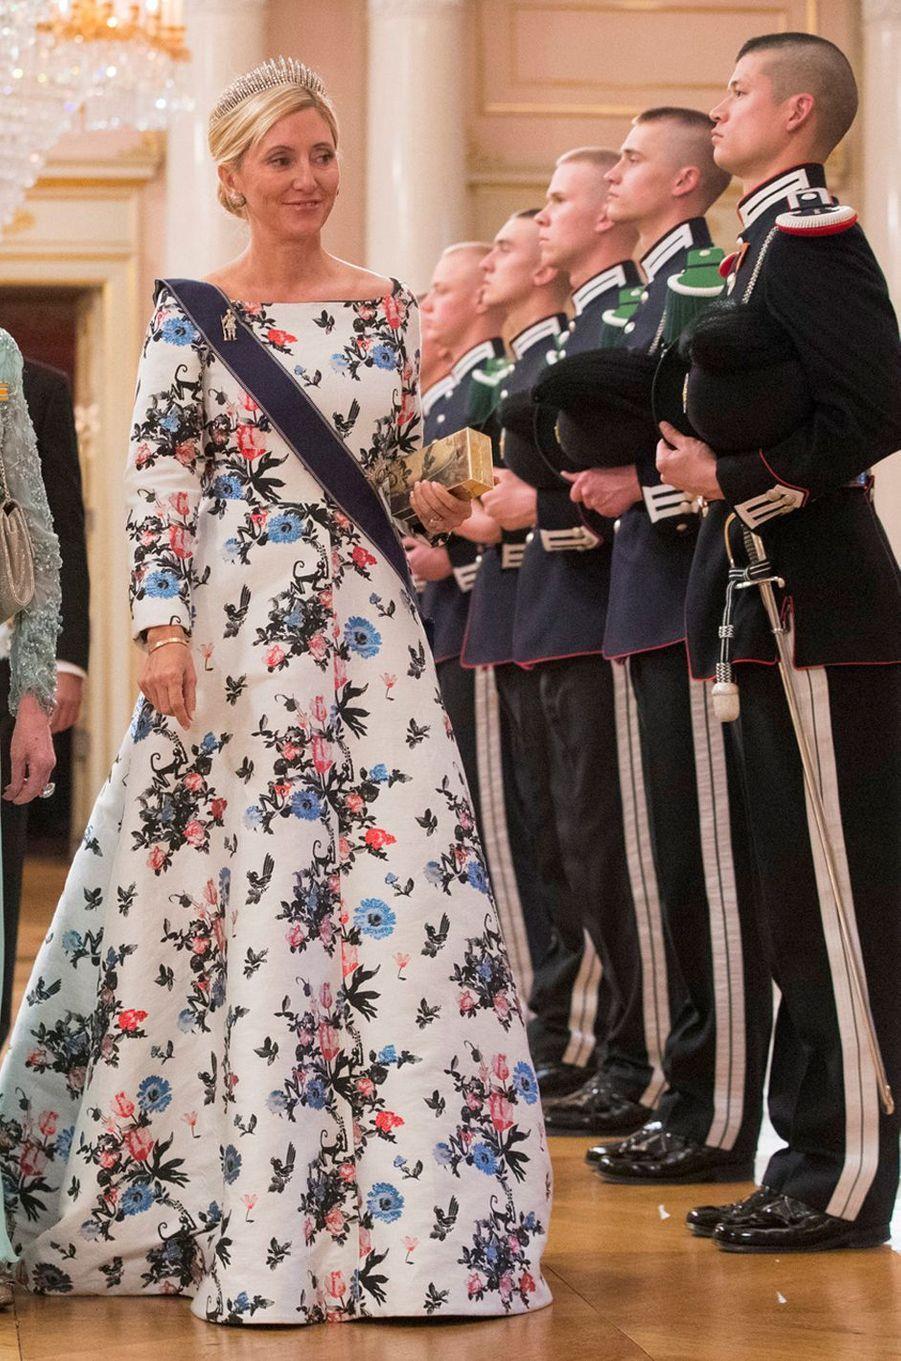 La princesse Marie-Chantal de Grèce à Oslo le 9 mai 2017